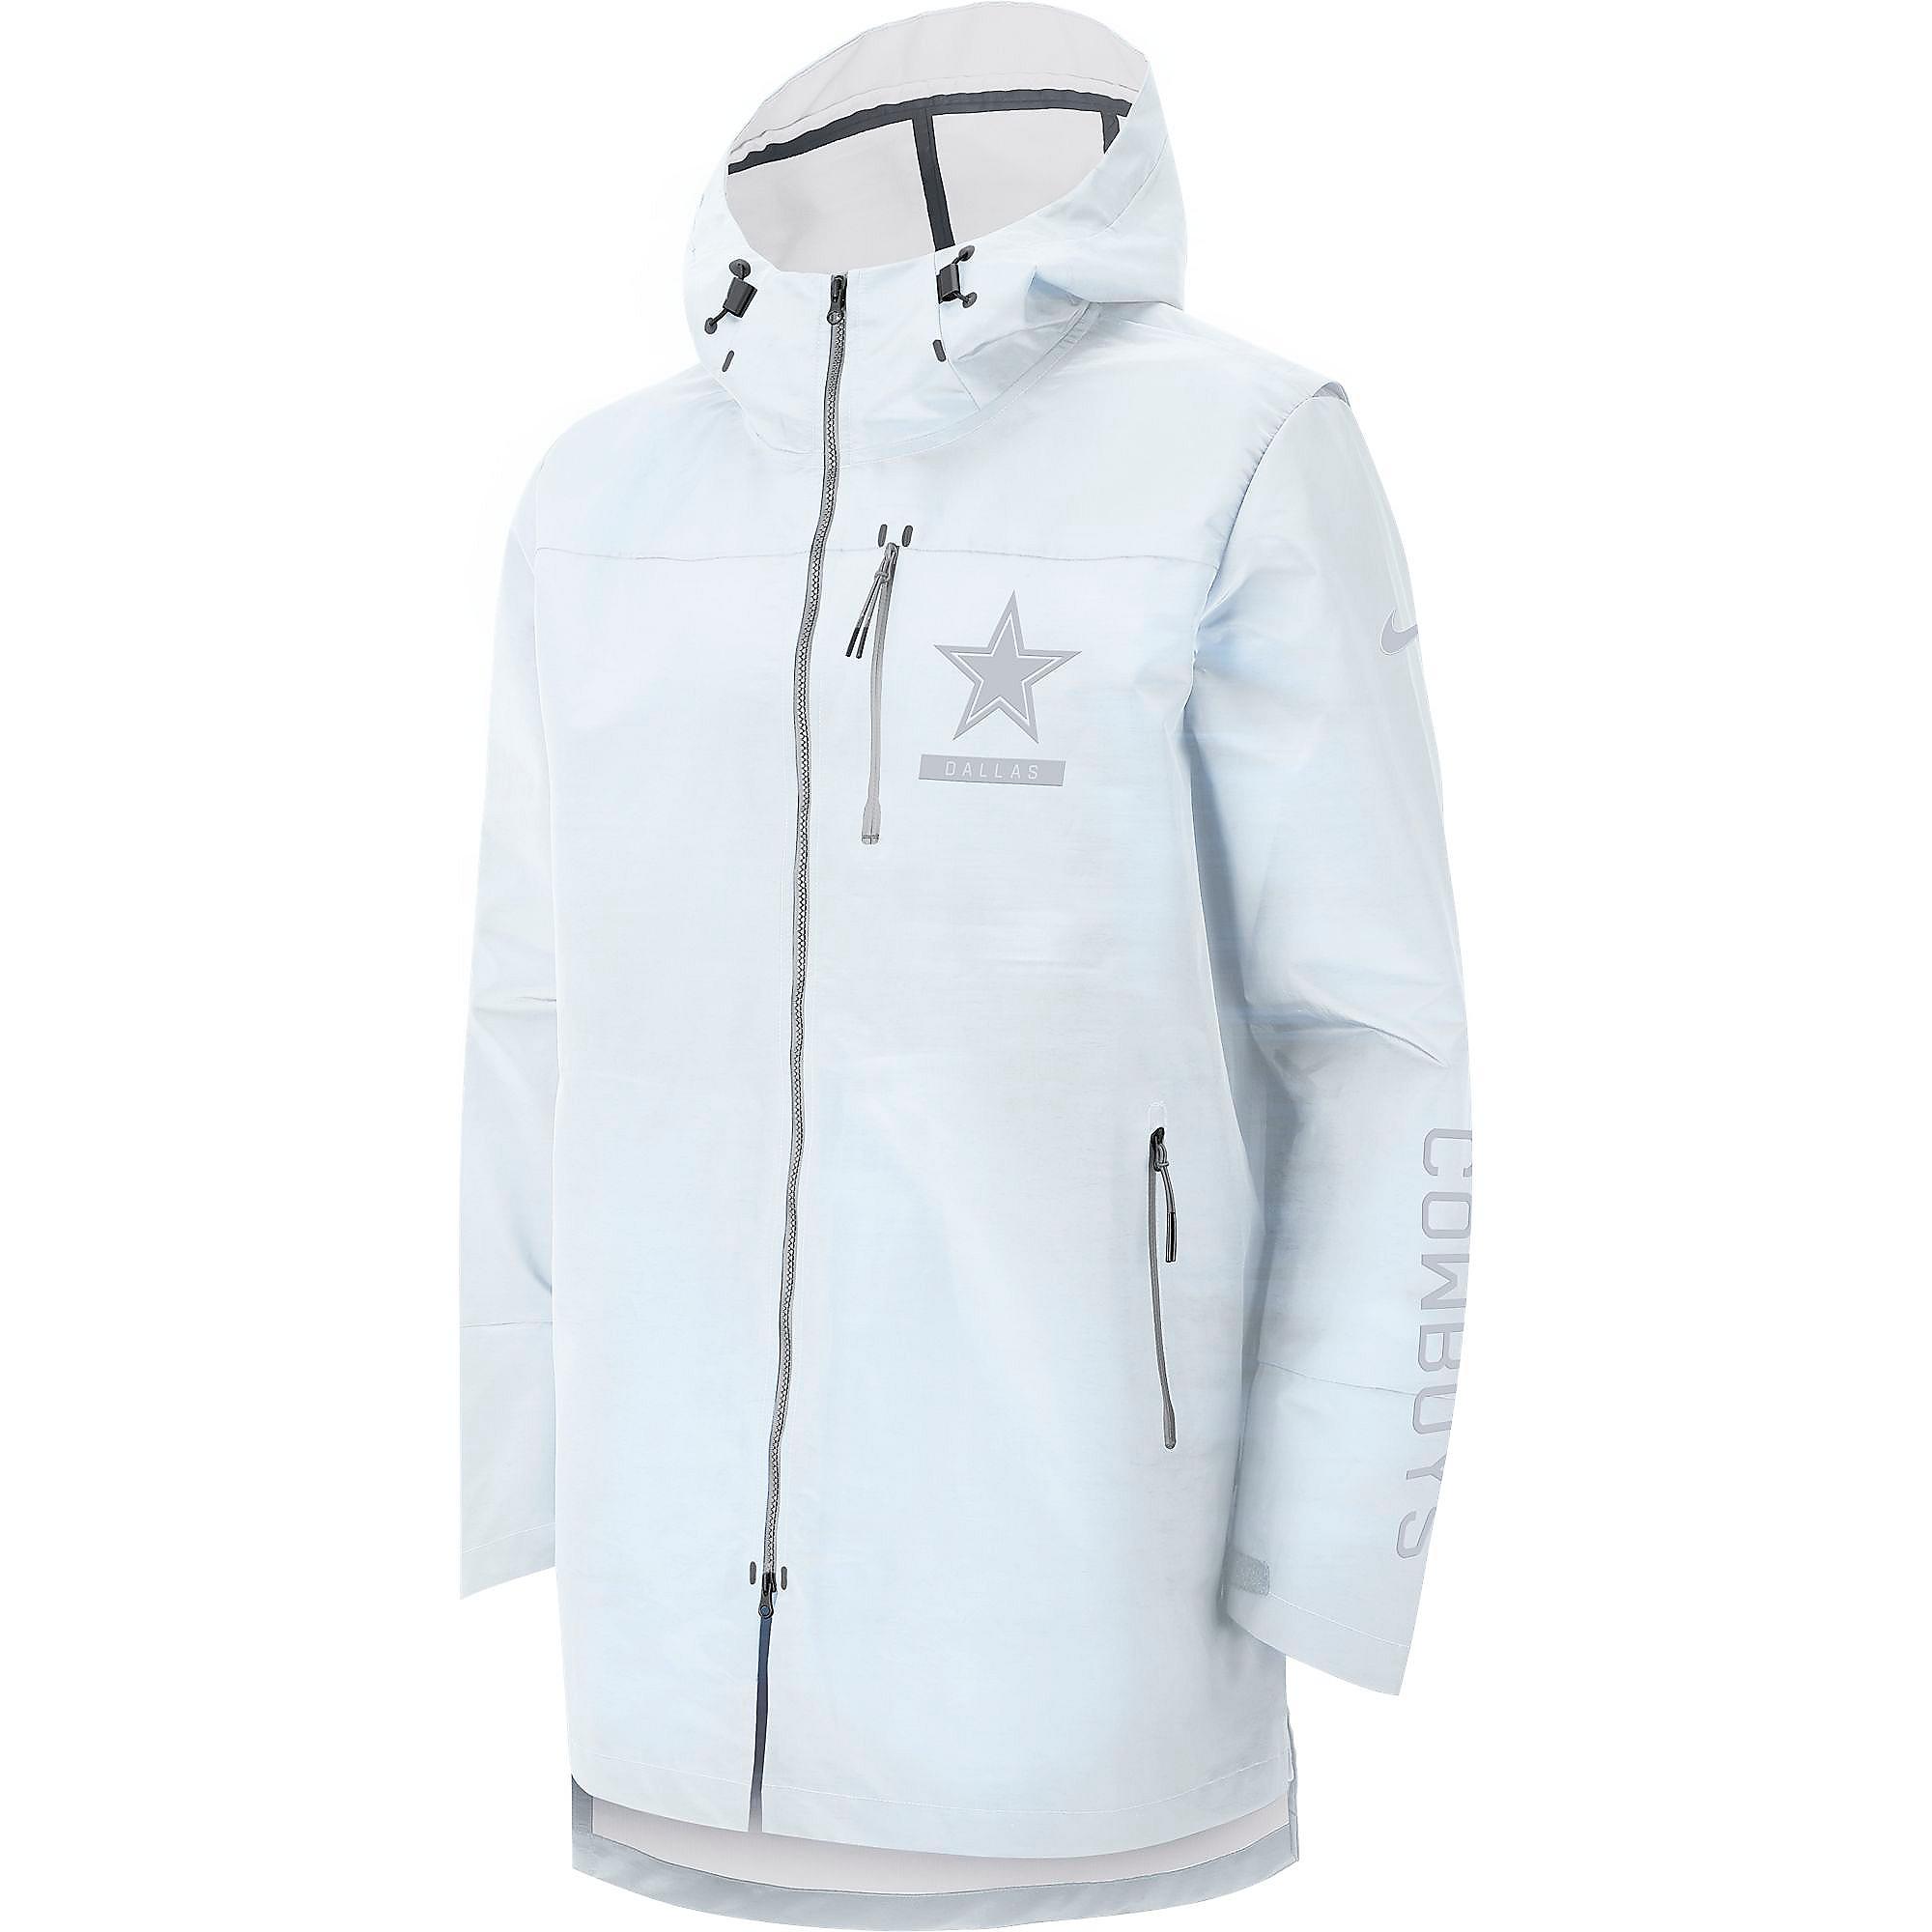 b1ef38a67 Dallas Cowboys Nike Sideline Away Players Cape Jacket